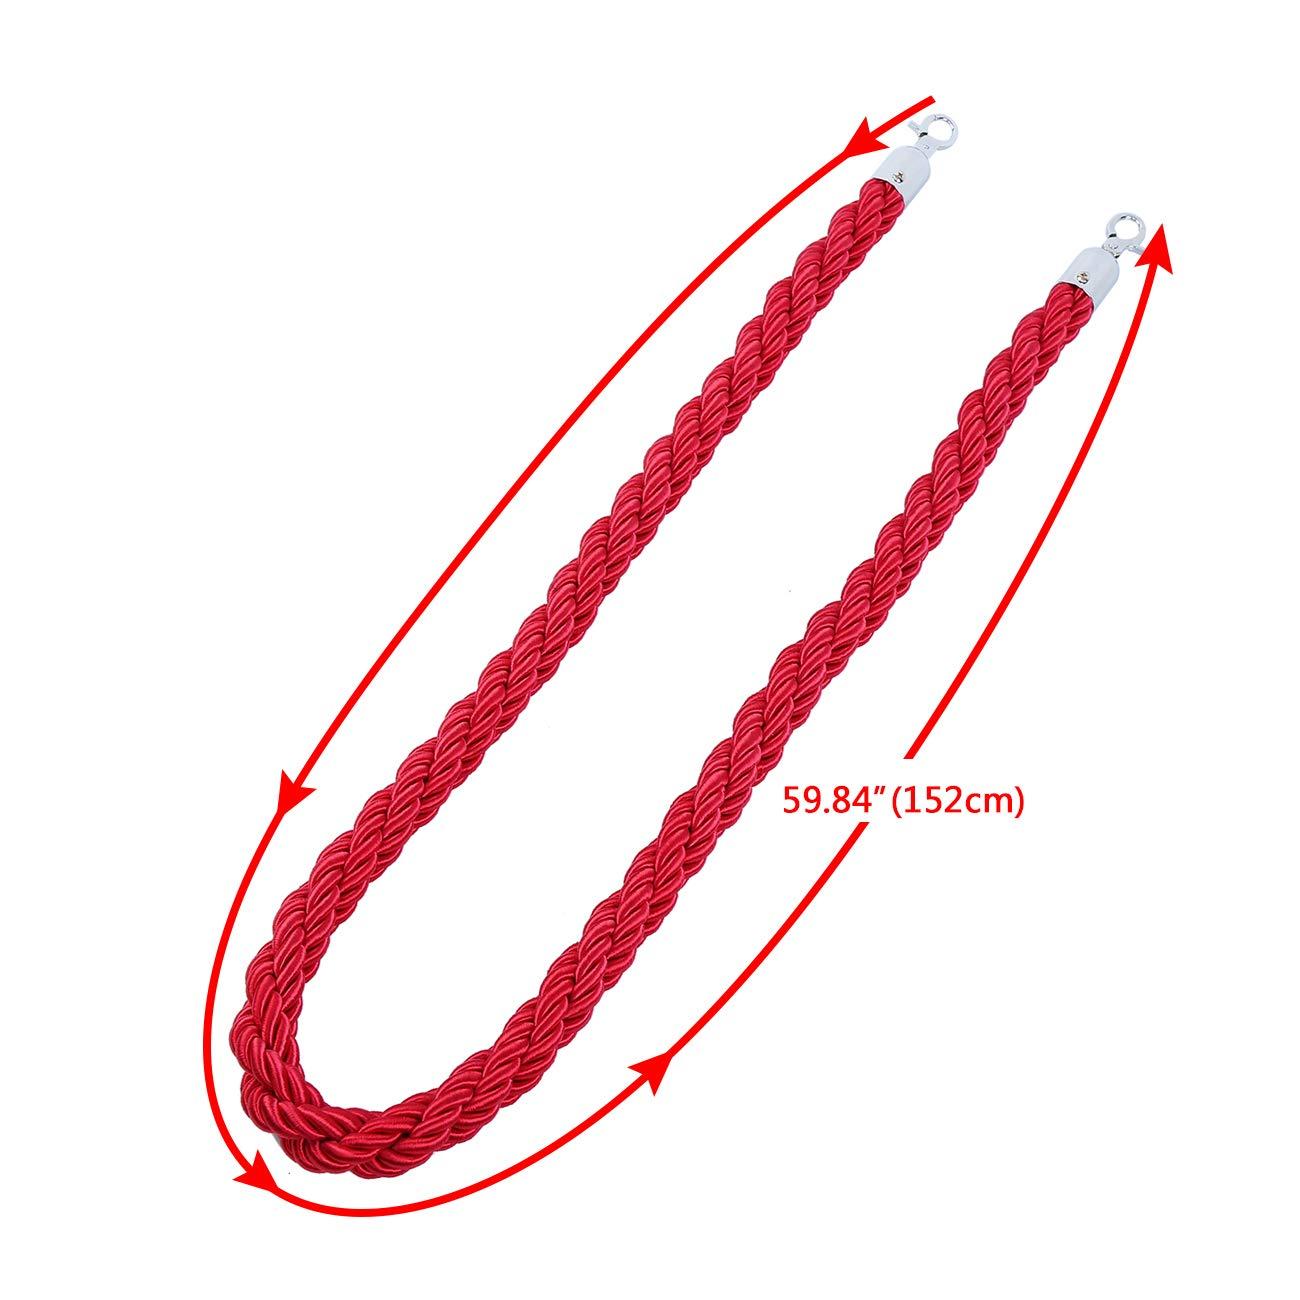 Samger 155cm Barrier Rope Queue Divider Crowd Control Stanchion Line with Hooks Black